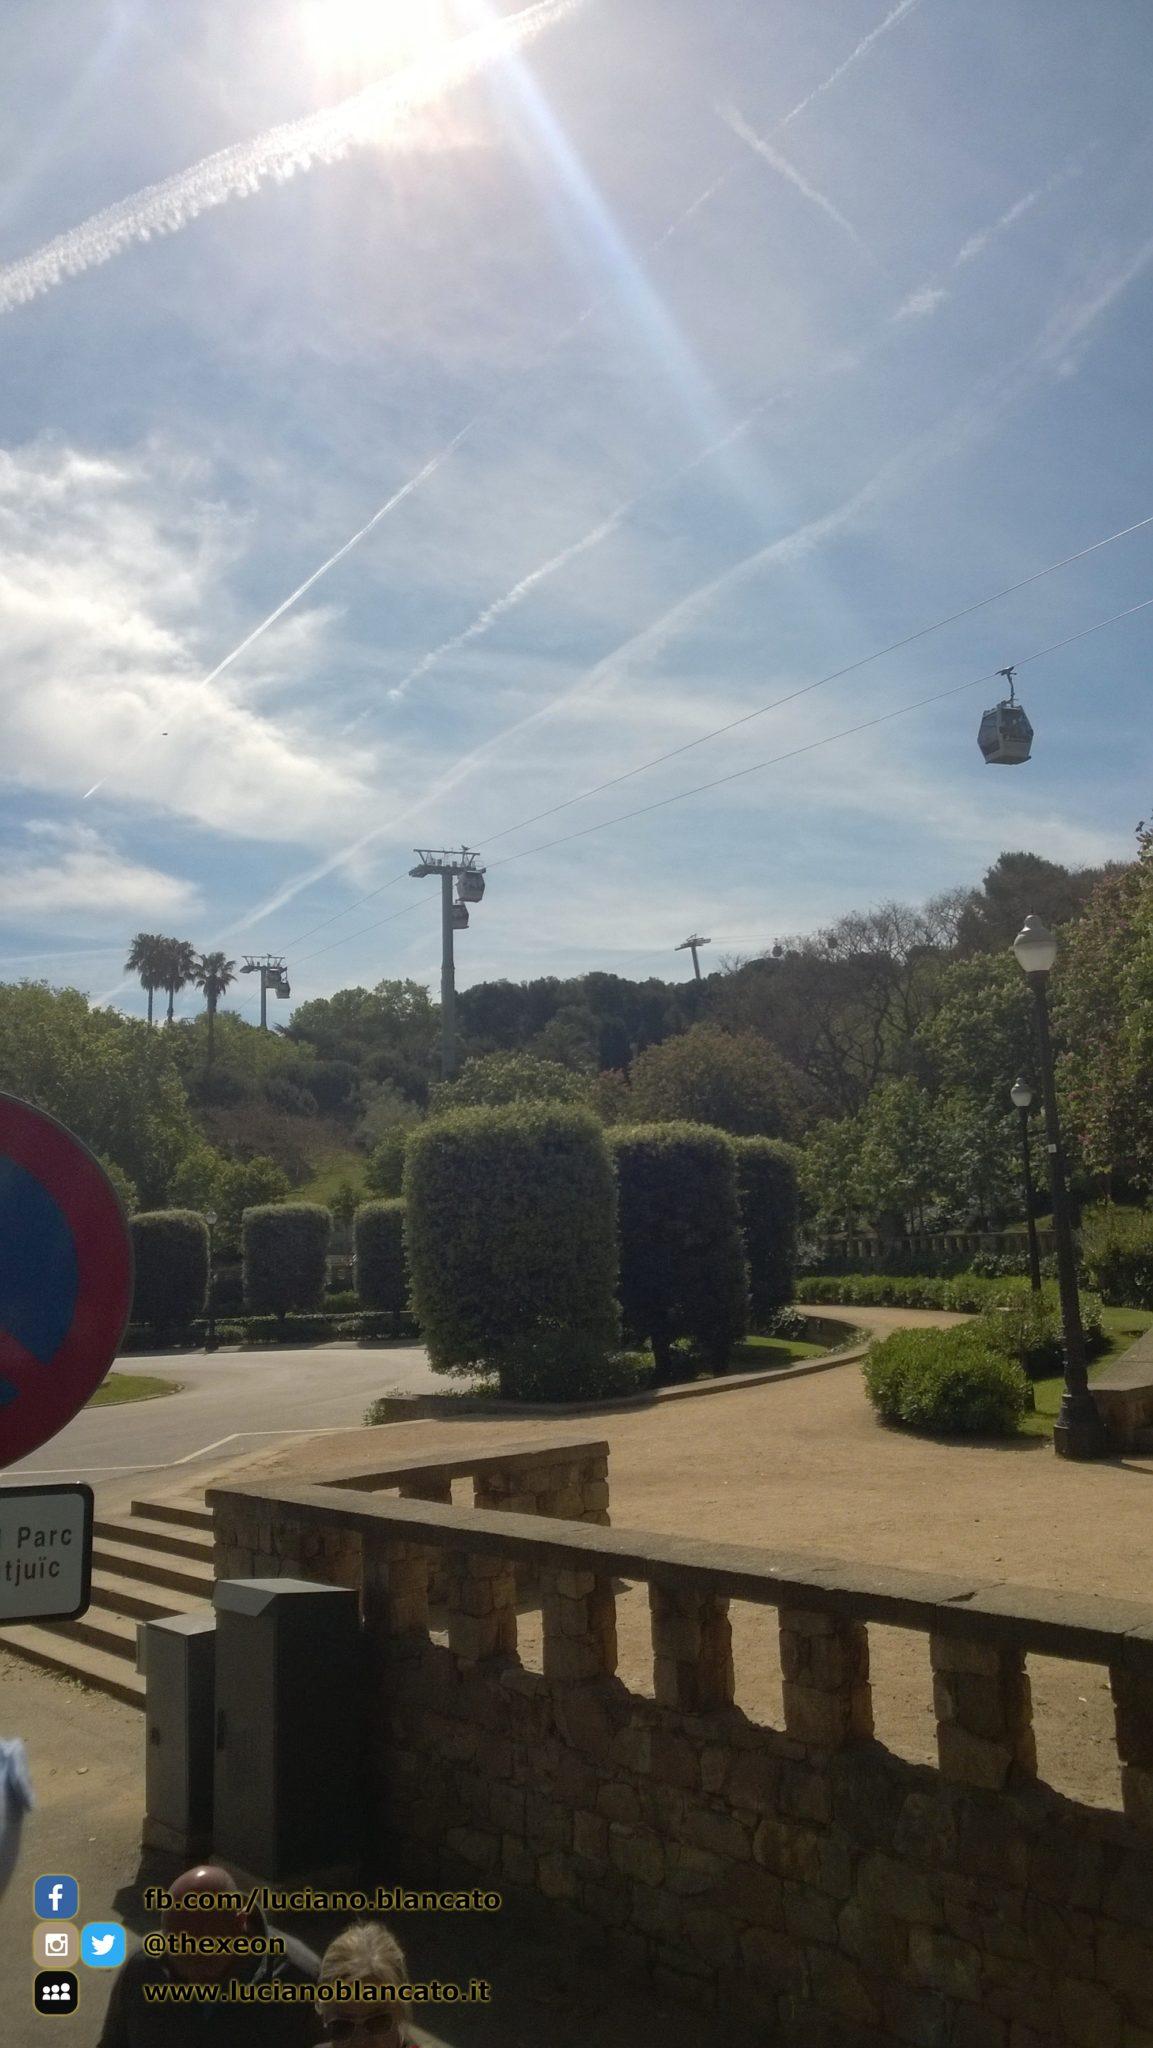 W1 Vueling a Barcellona - 2014 - foto n 0057